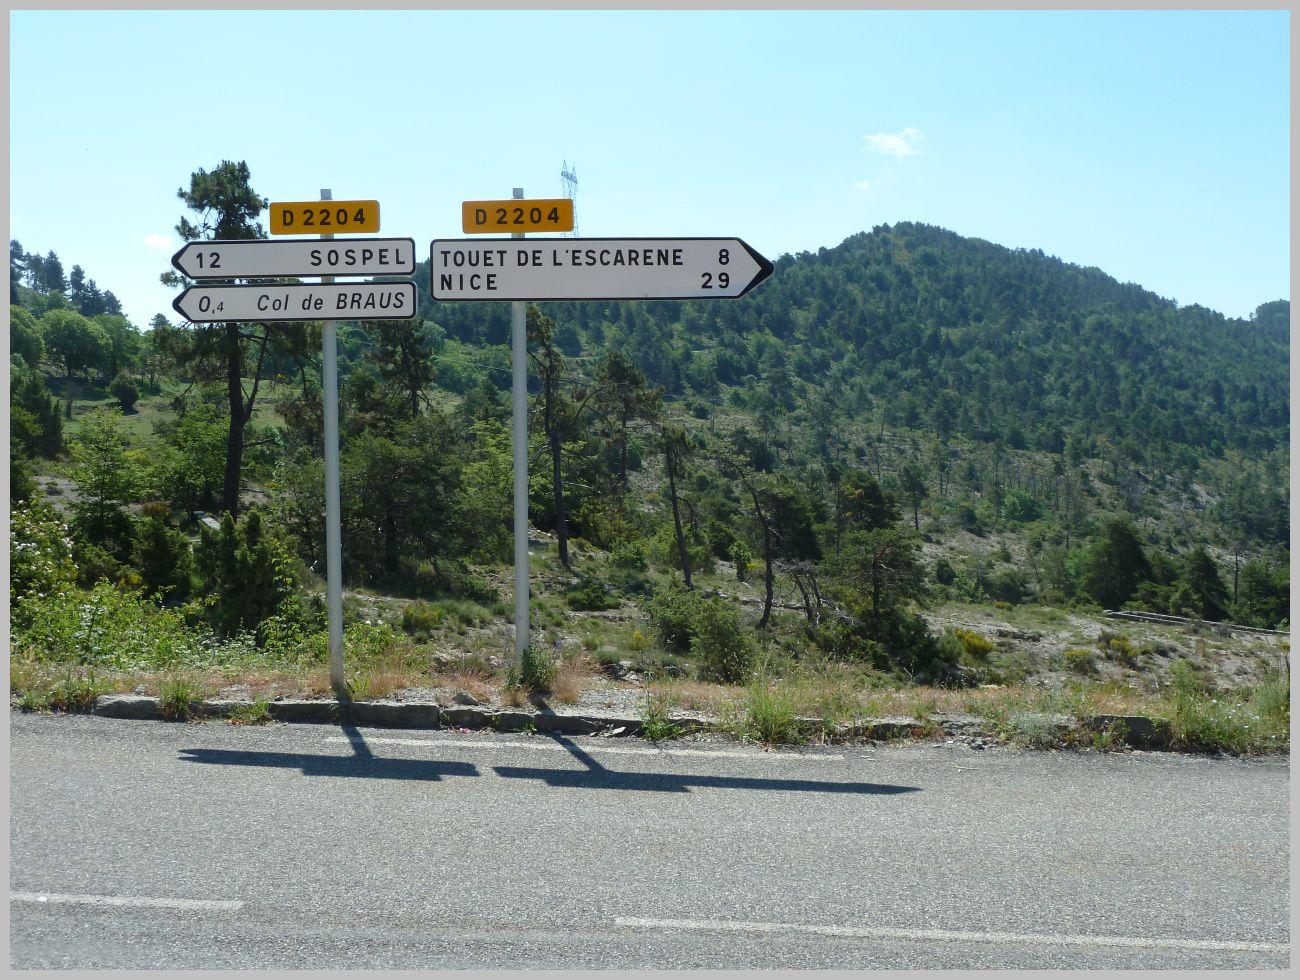 201206_Korsika_Moped066